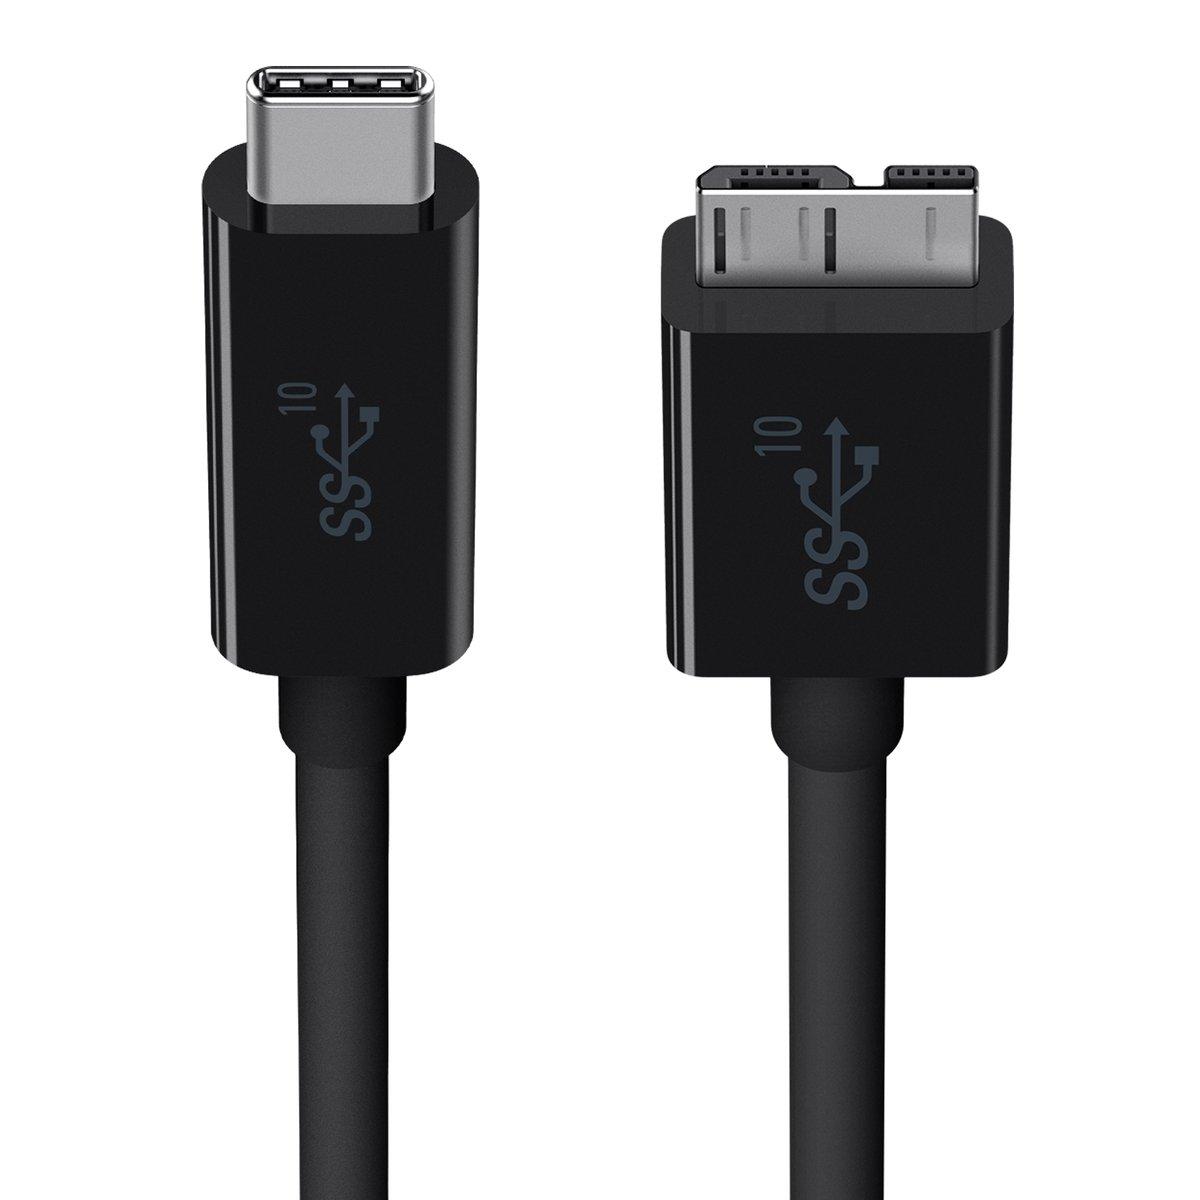 USB 3.1 USB-C 轉 Micro-B 線纜 (USBIF 認證)